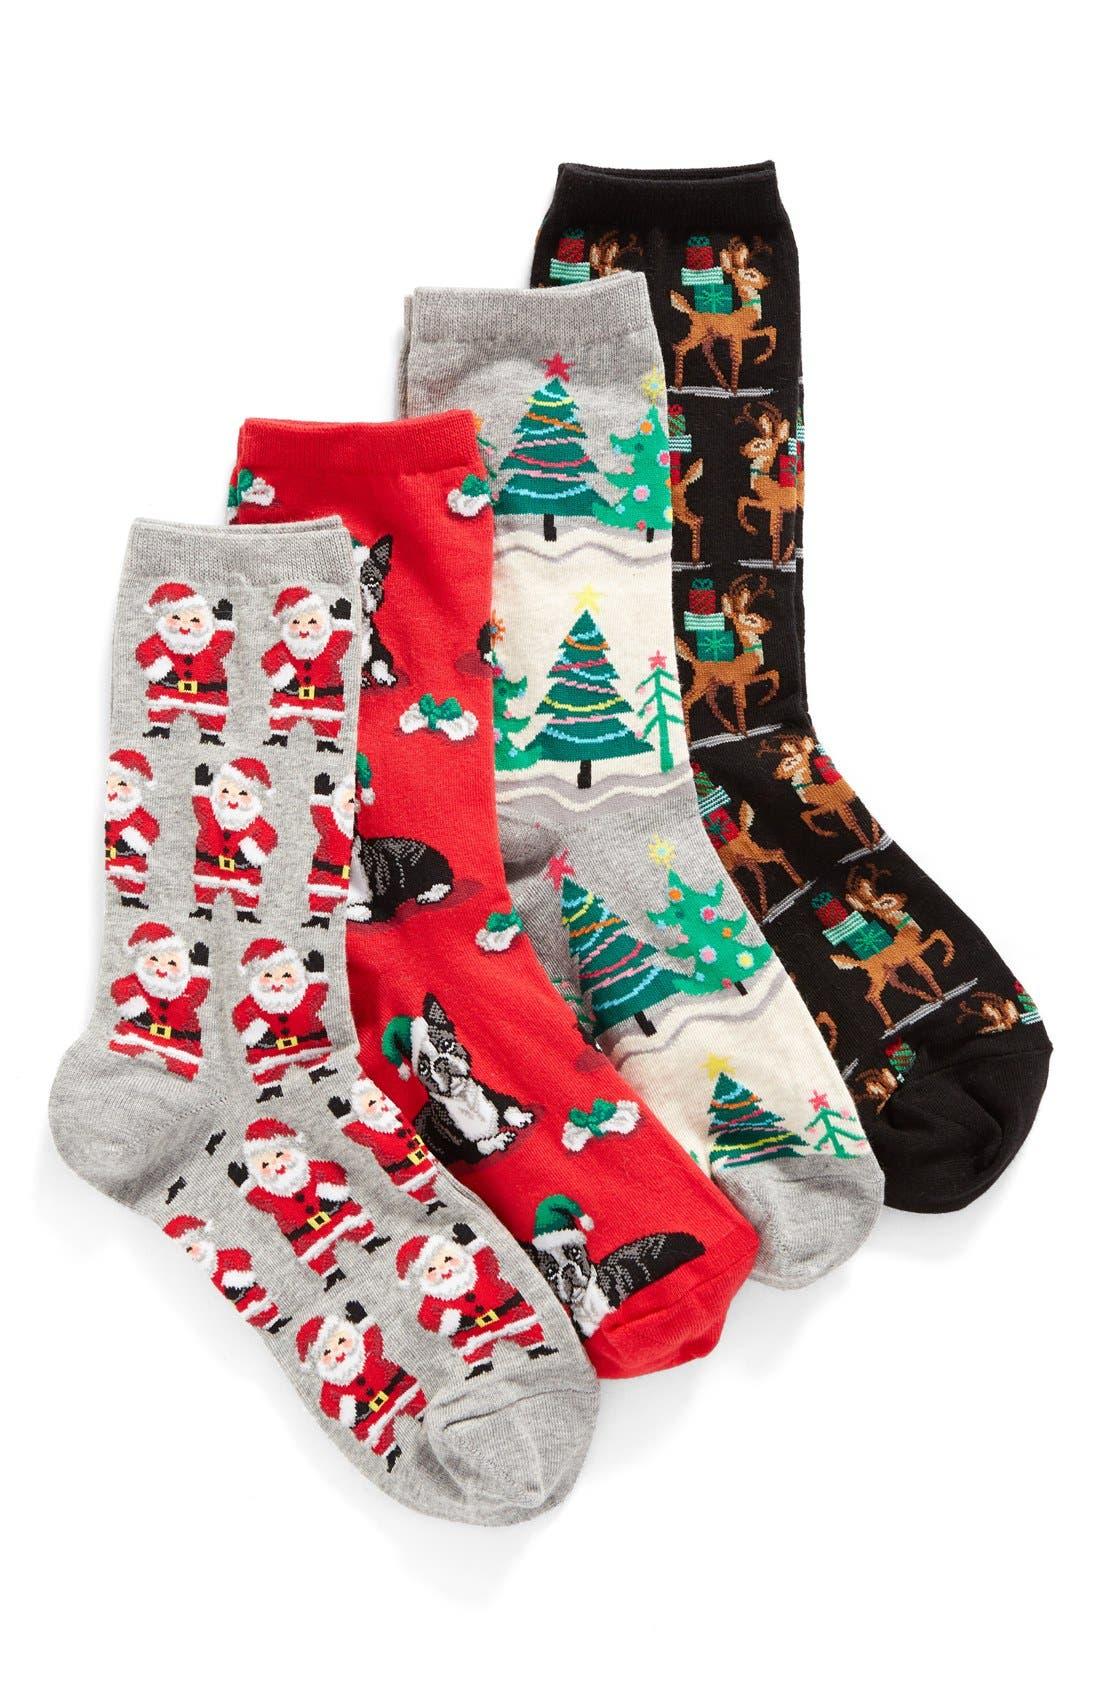 Holiday Socks Gift Set,                             Alternate thumbnail 3, color,                             020